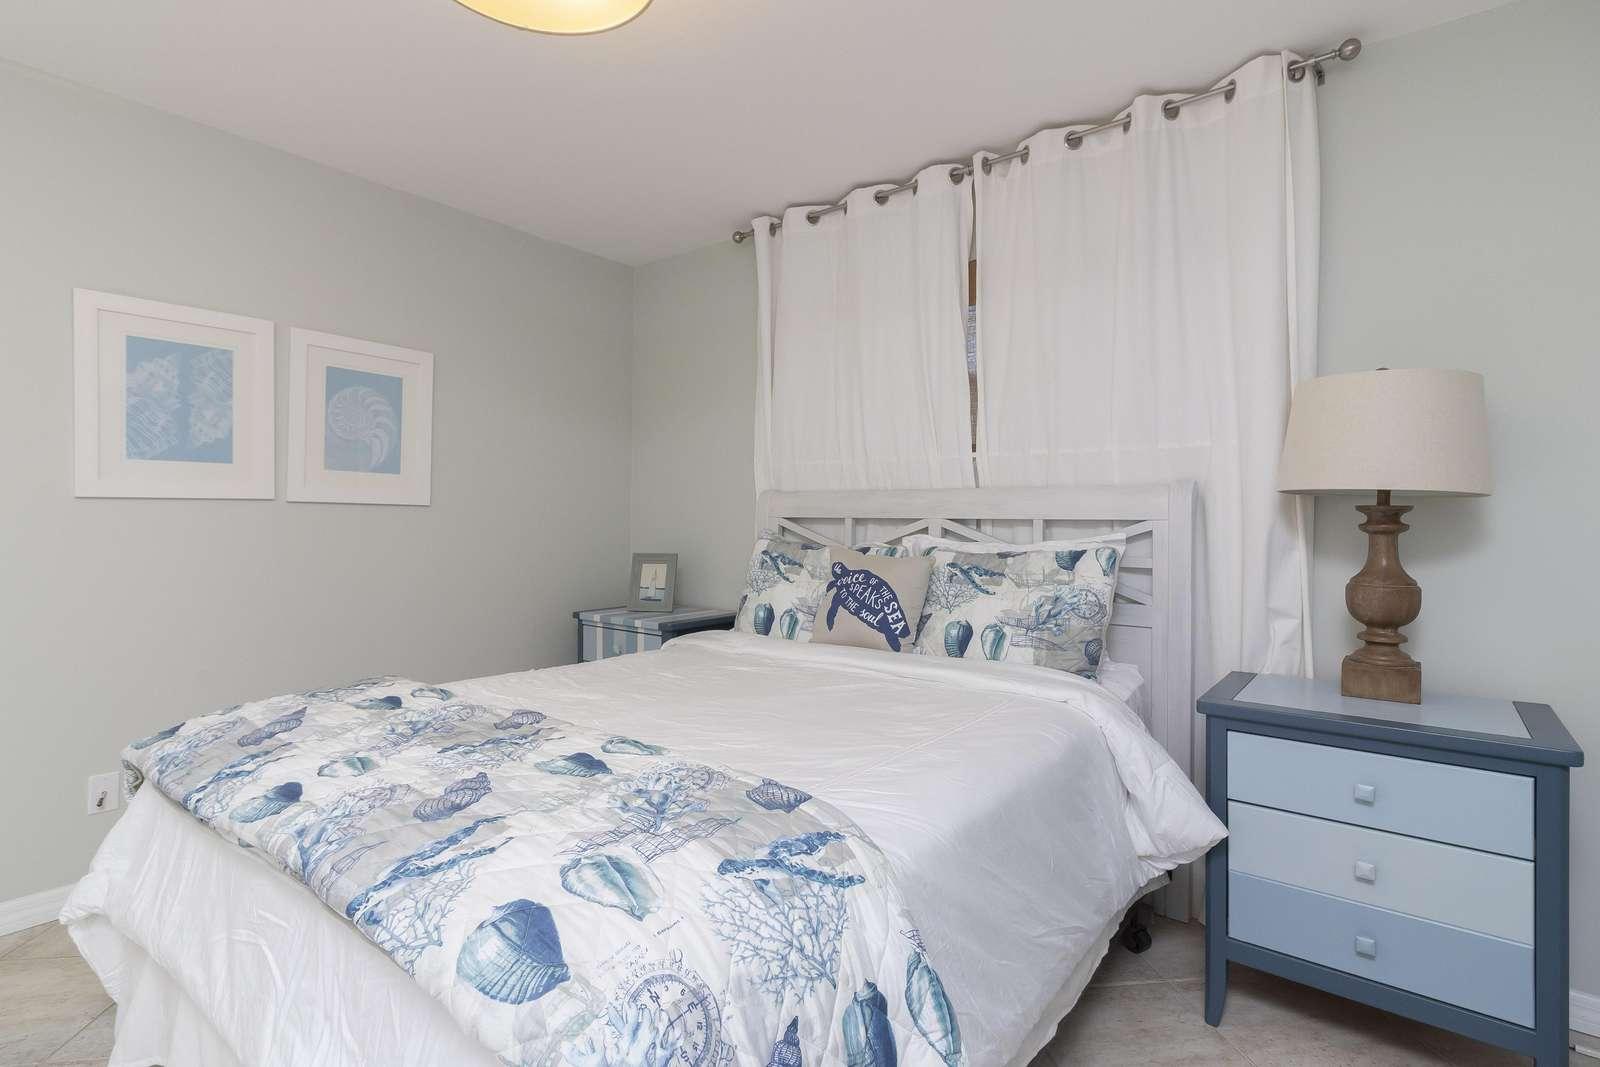 Ocean Sunrise - Guest Bedroom 2nd Floor